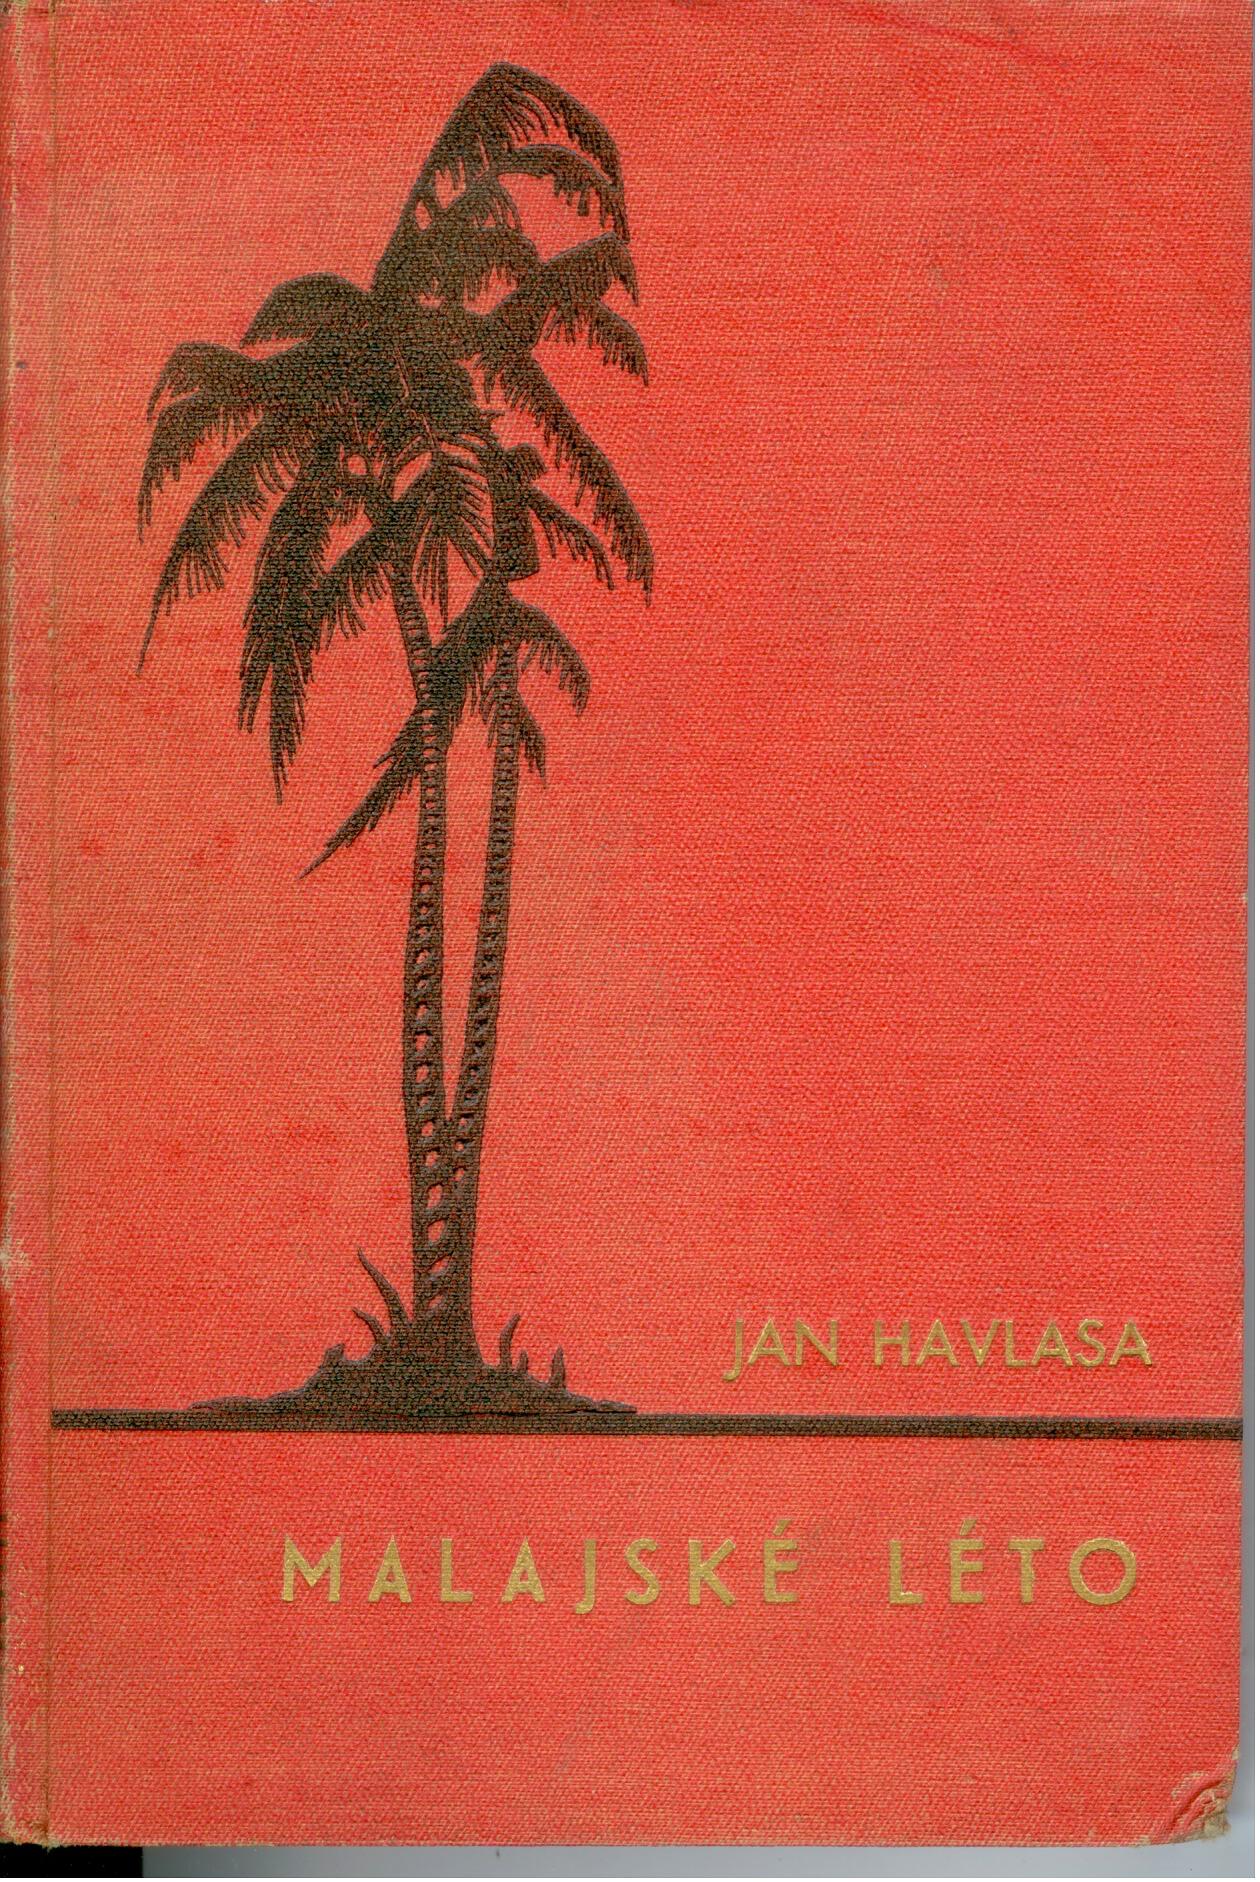 Malajské léto - Jan Havlasa